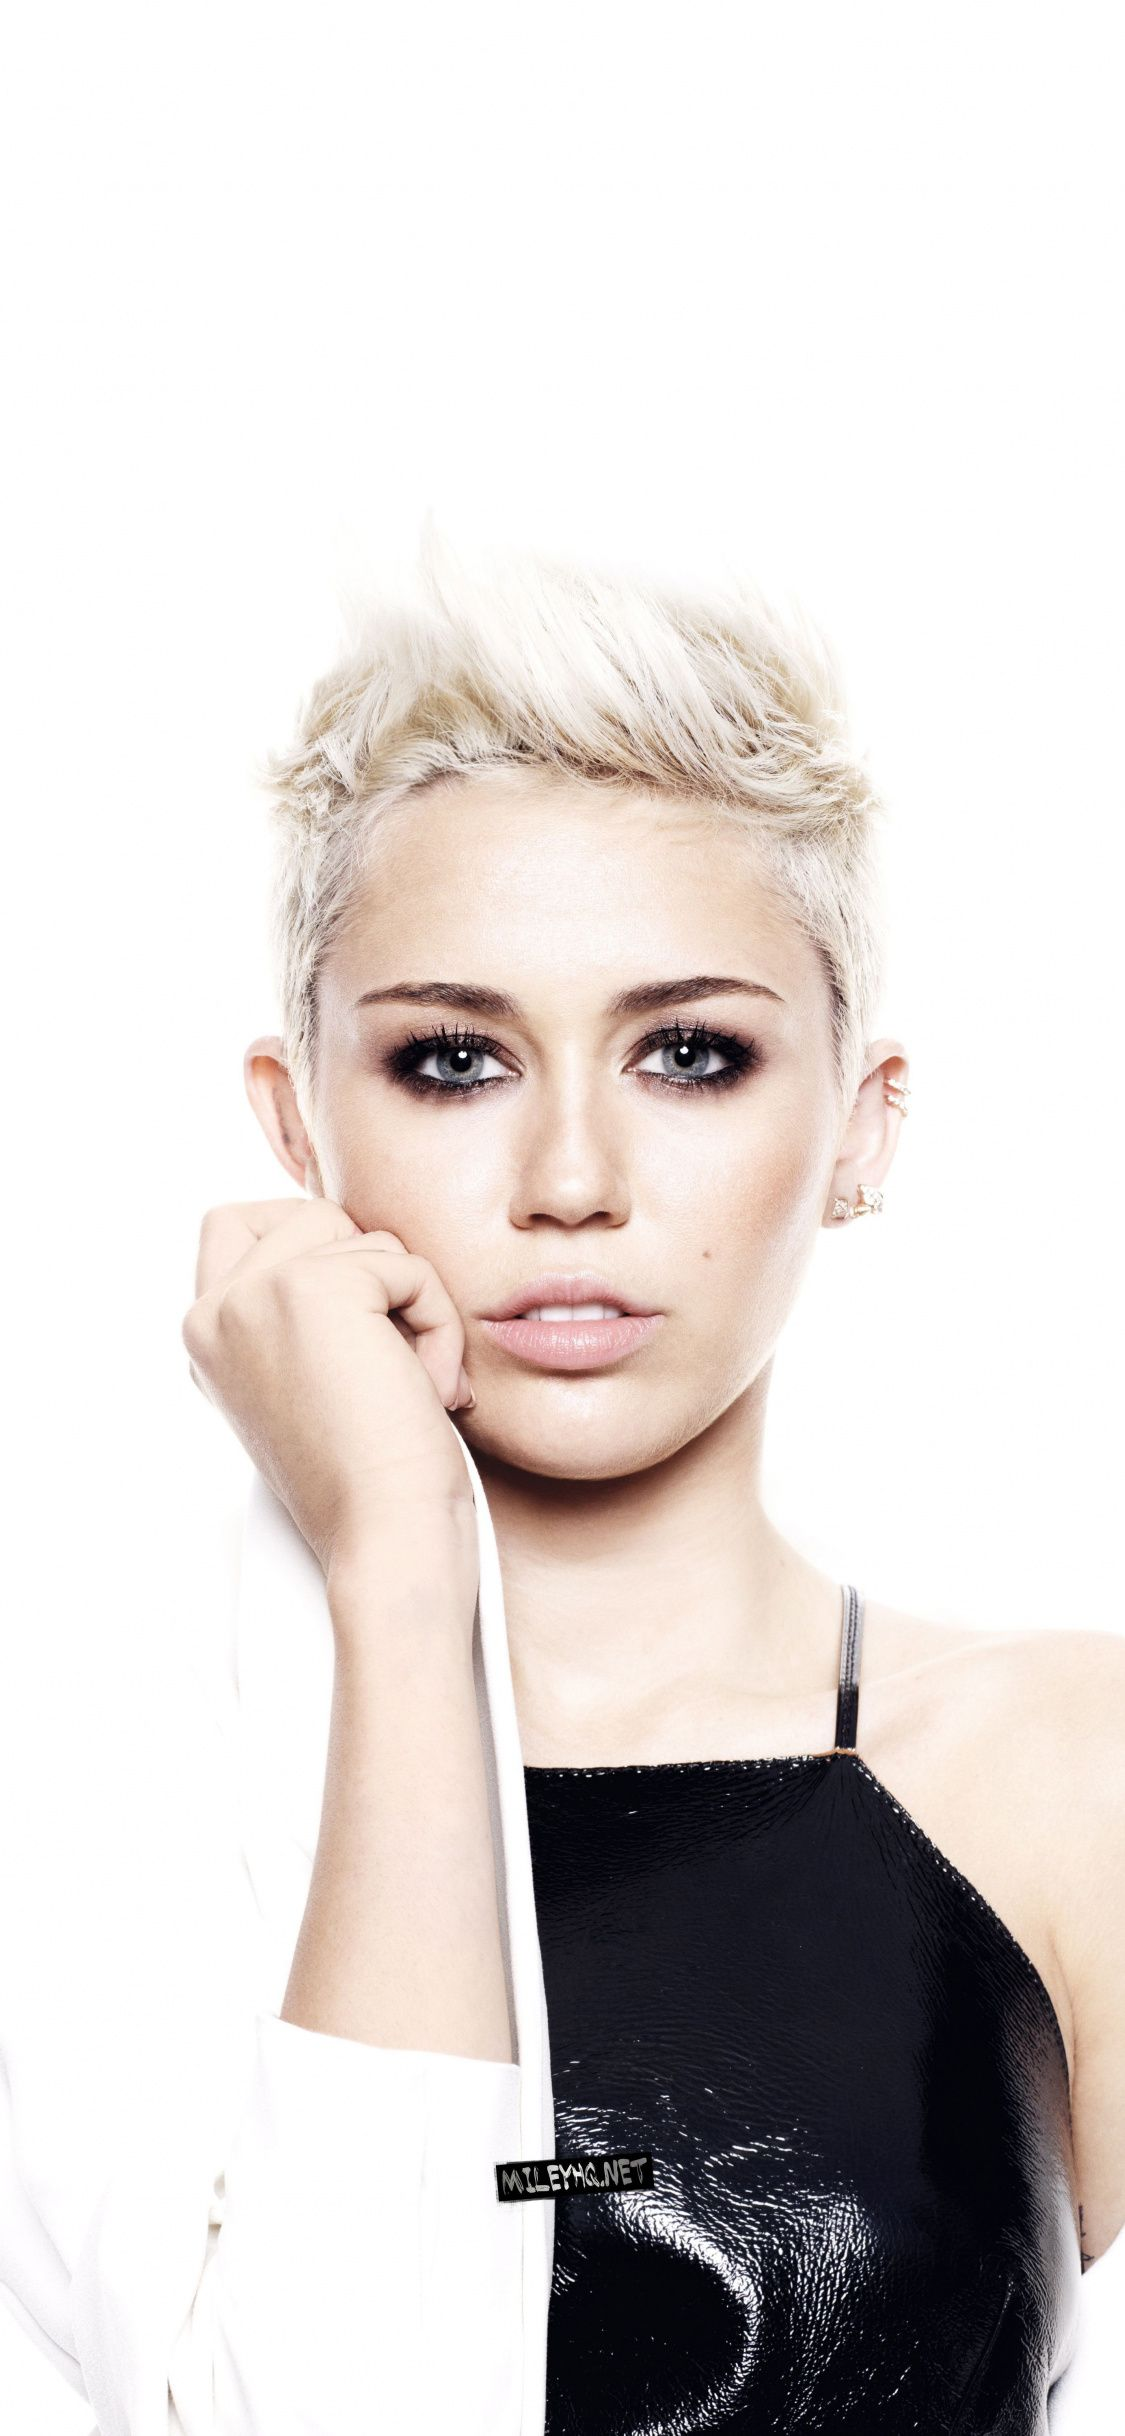 Miley Cyrus Short Hair 2018 1125x2436 Wallpaper Short Hair Styles Miley Cyrus Miley